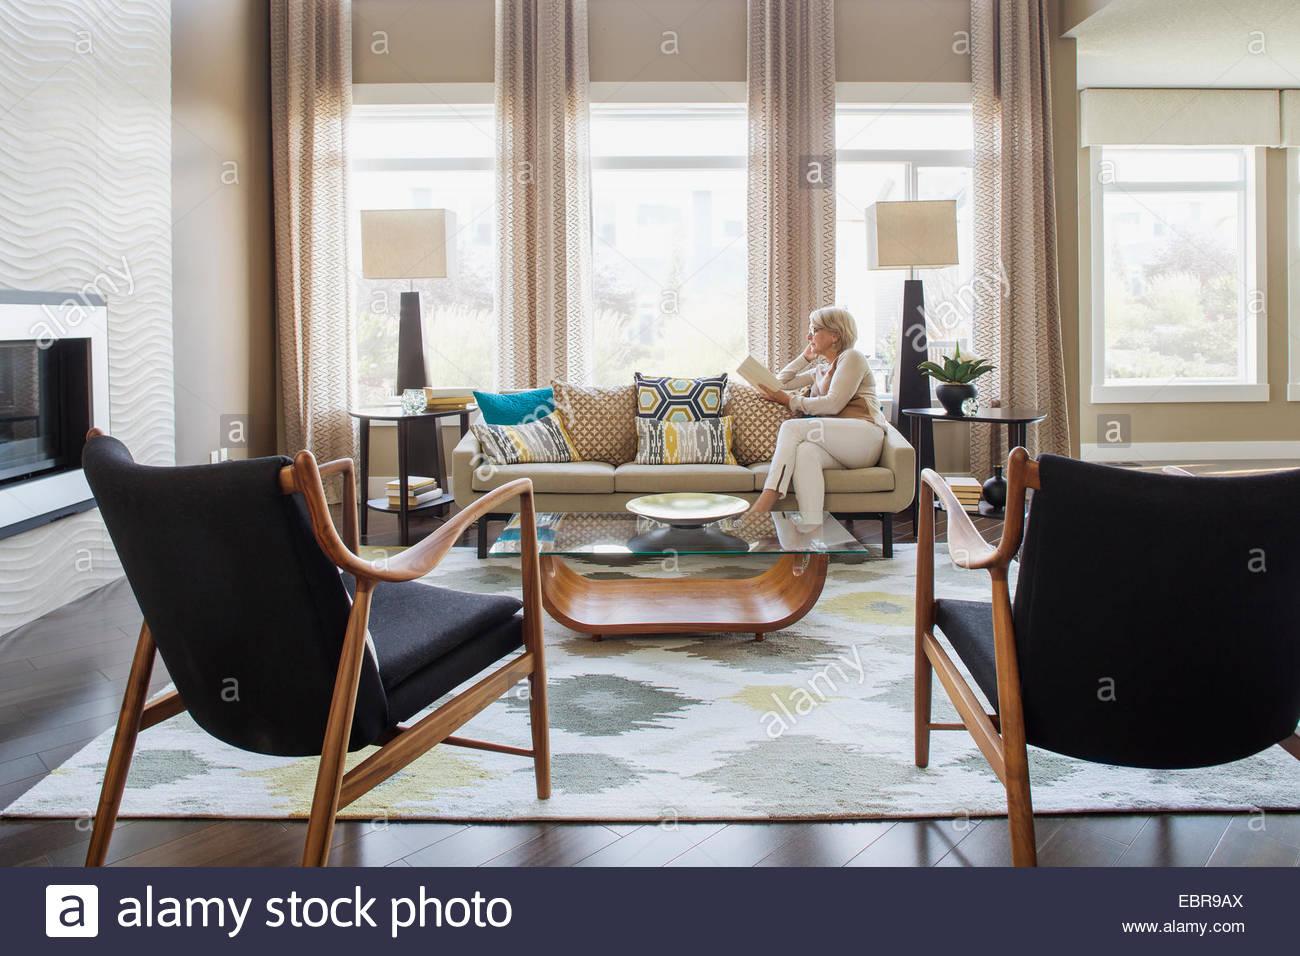 Woman Reading Book On Modern Living Room Sofa